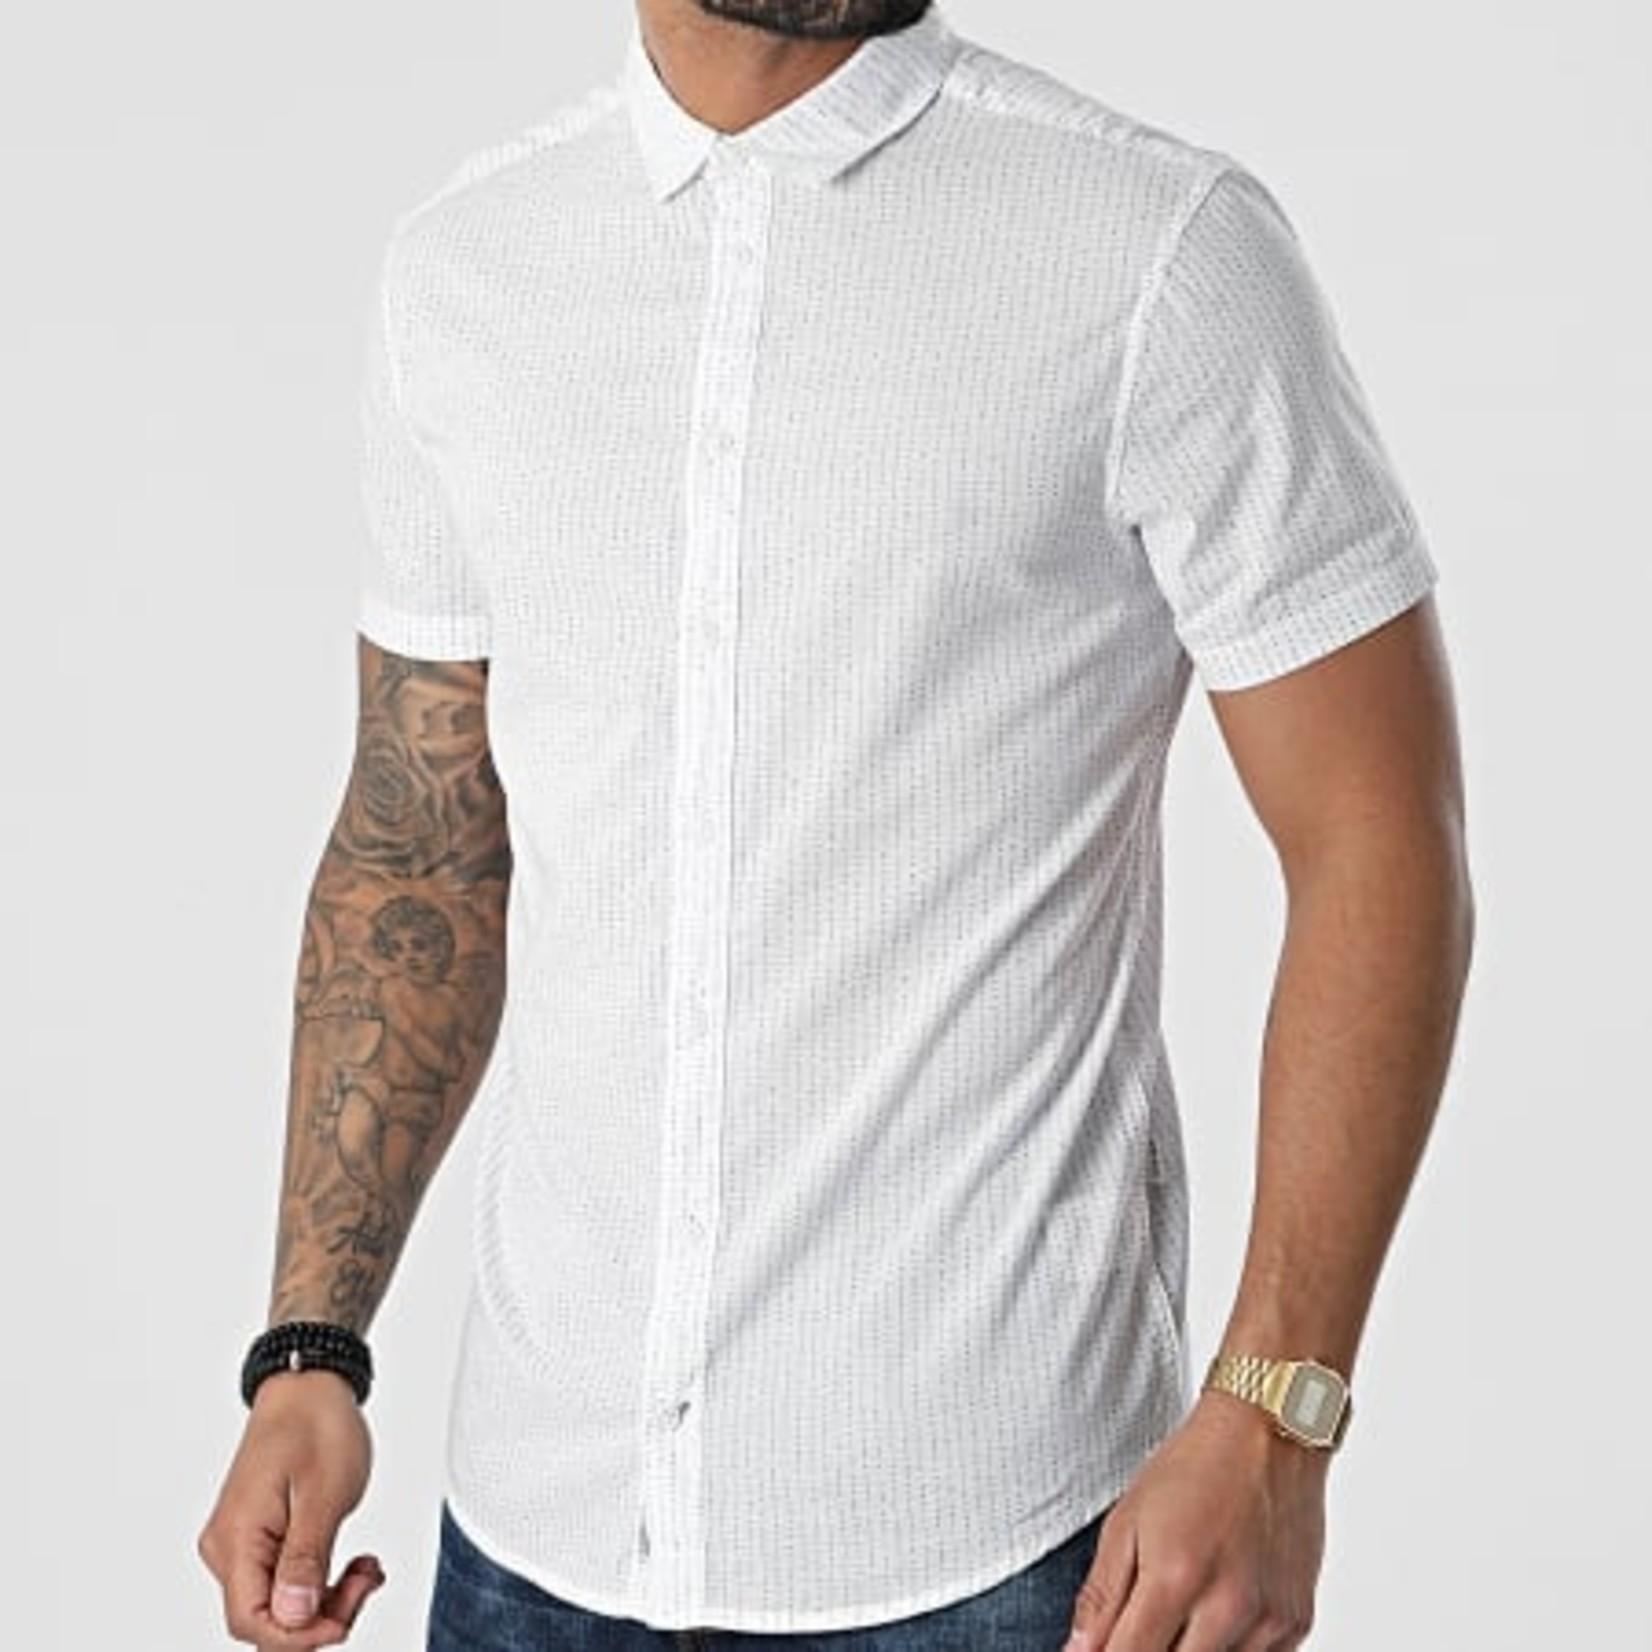 Blend Blend 20712155 Micro Symbol Shirt